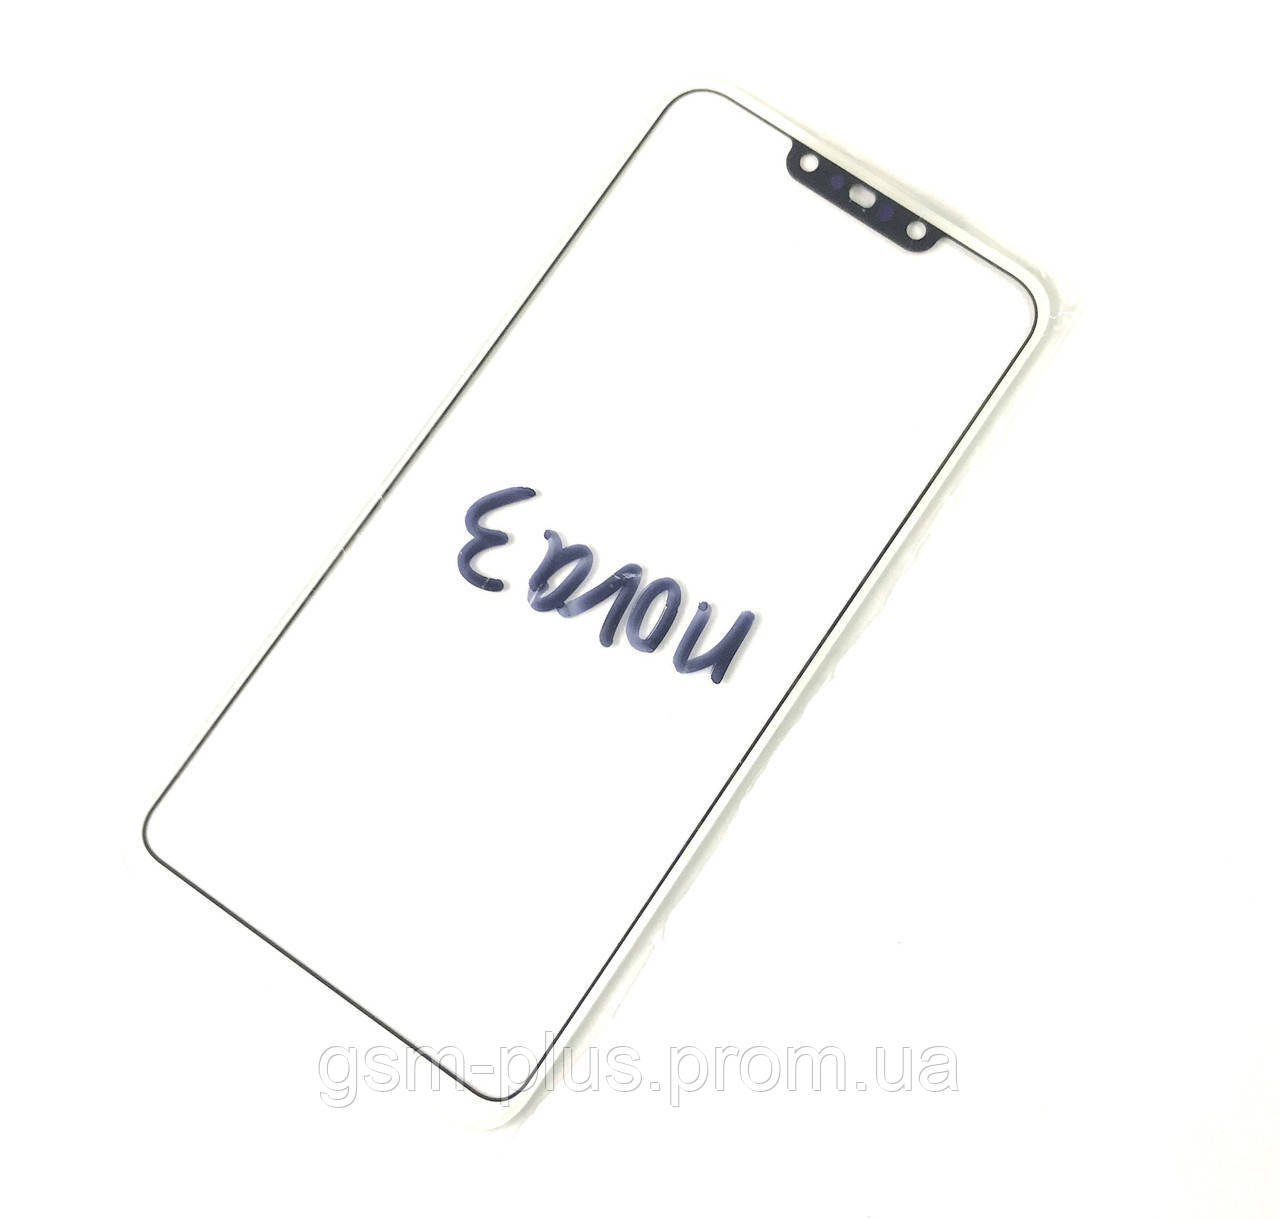 Стекло дисплея Huawei Nova 3 (PAR-LX1) White (для переклейки)